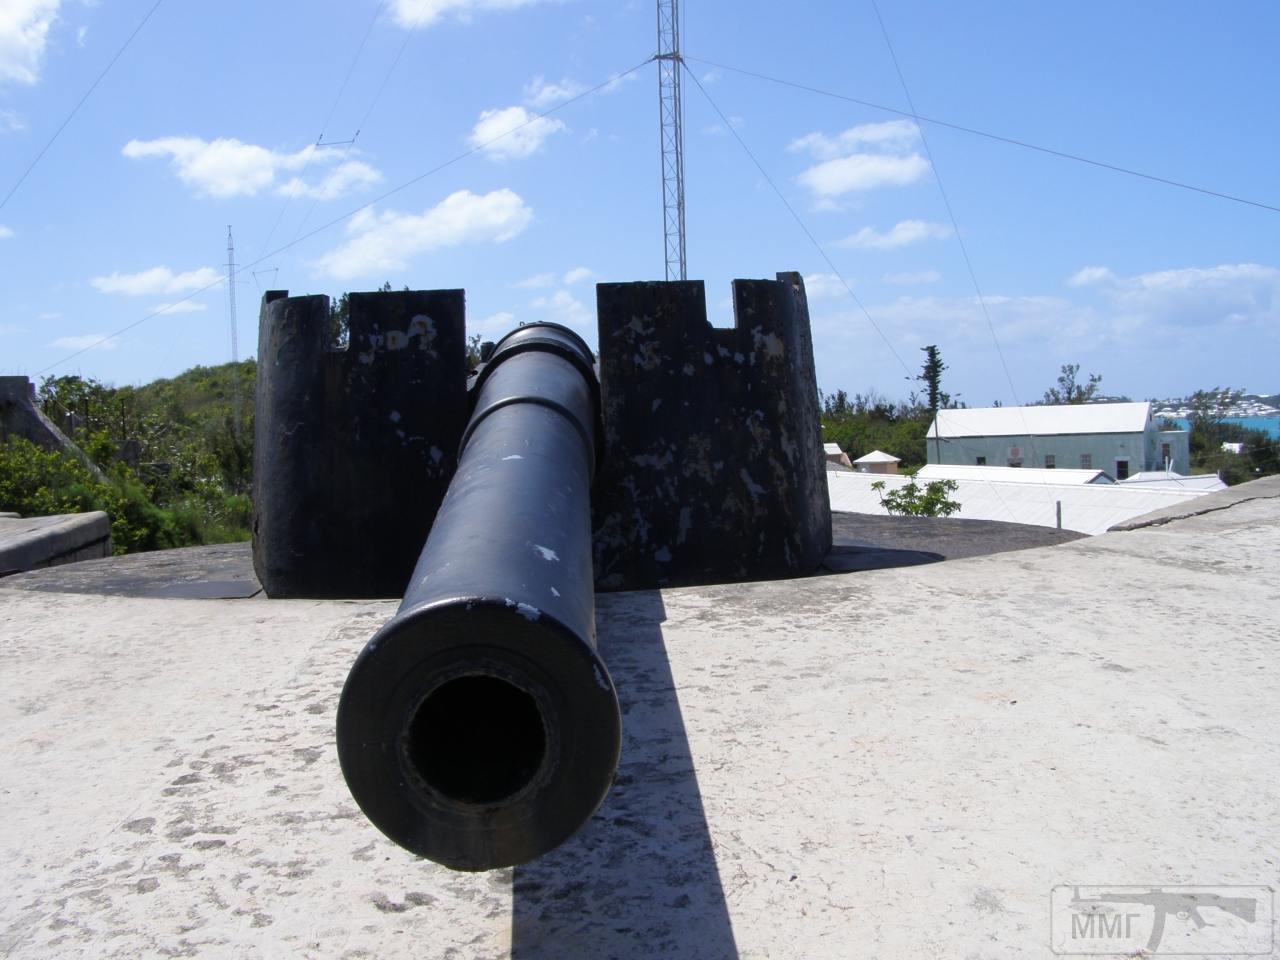 35010 - BL 9.2-inch Mk X